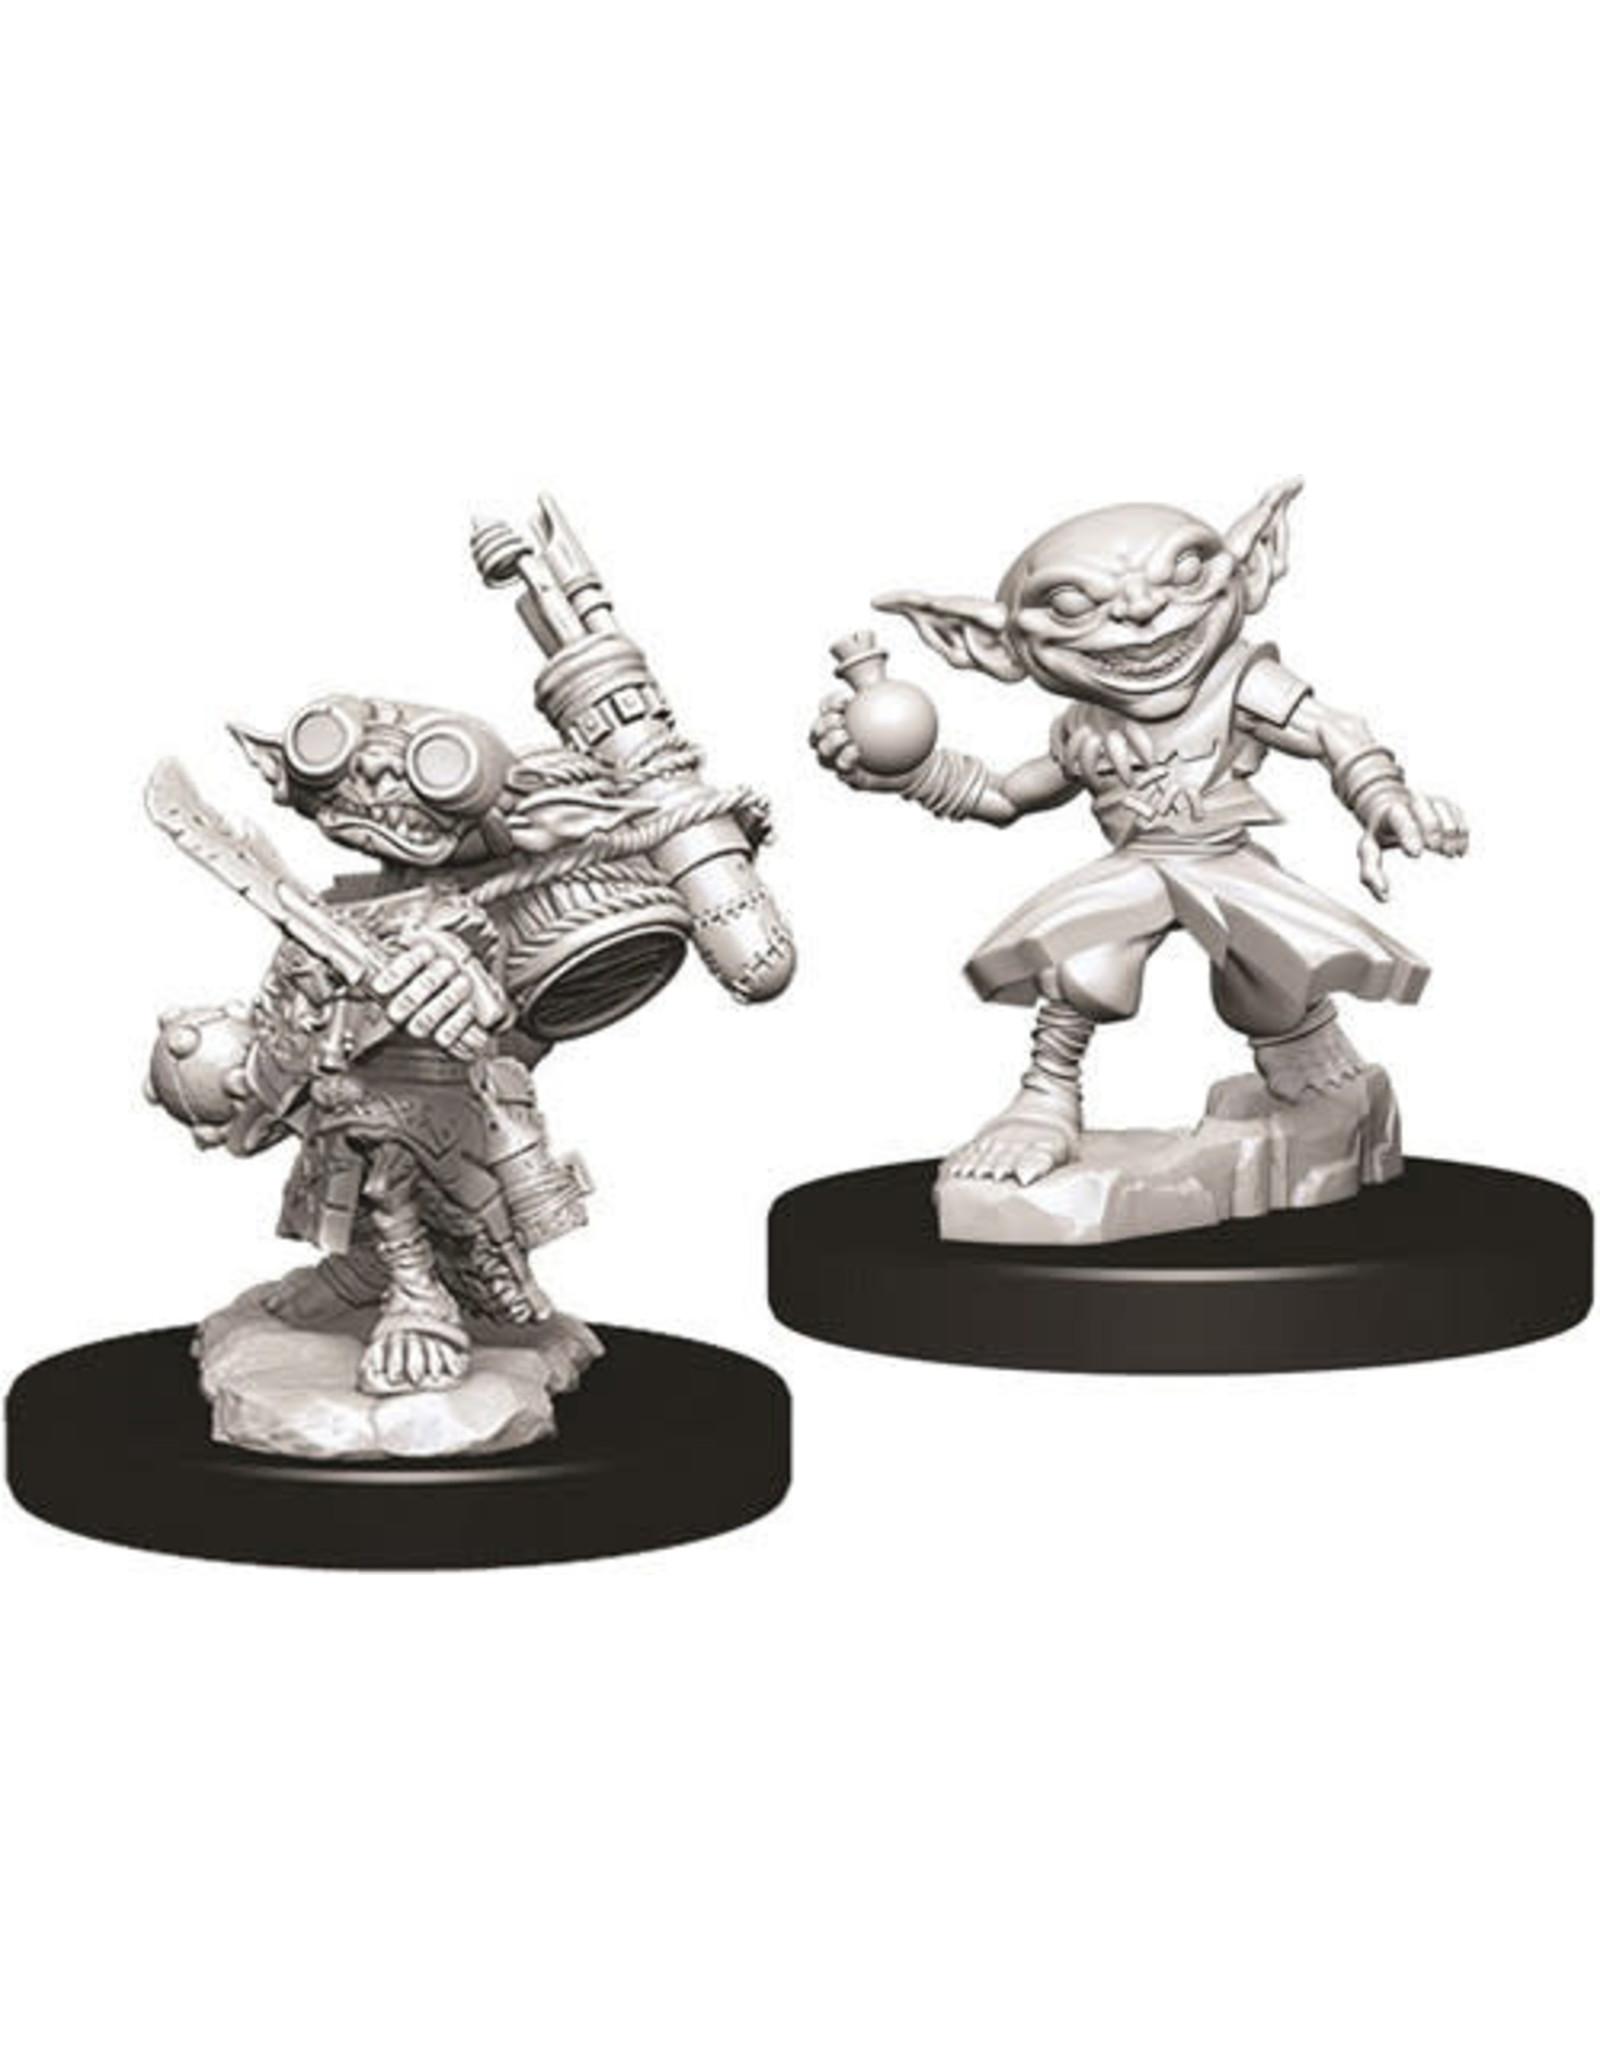 WizKids Pathfinder Deep Cuts Unpainted Miniatures: W9 Male Goblin Alchemist